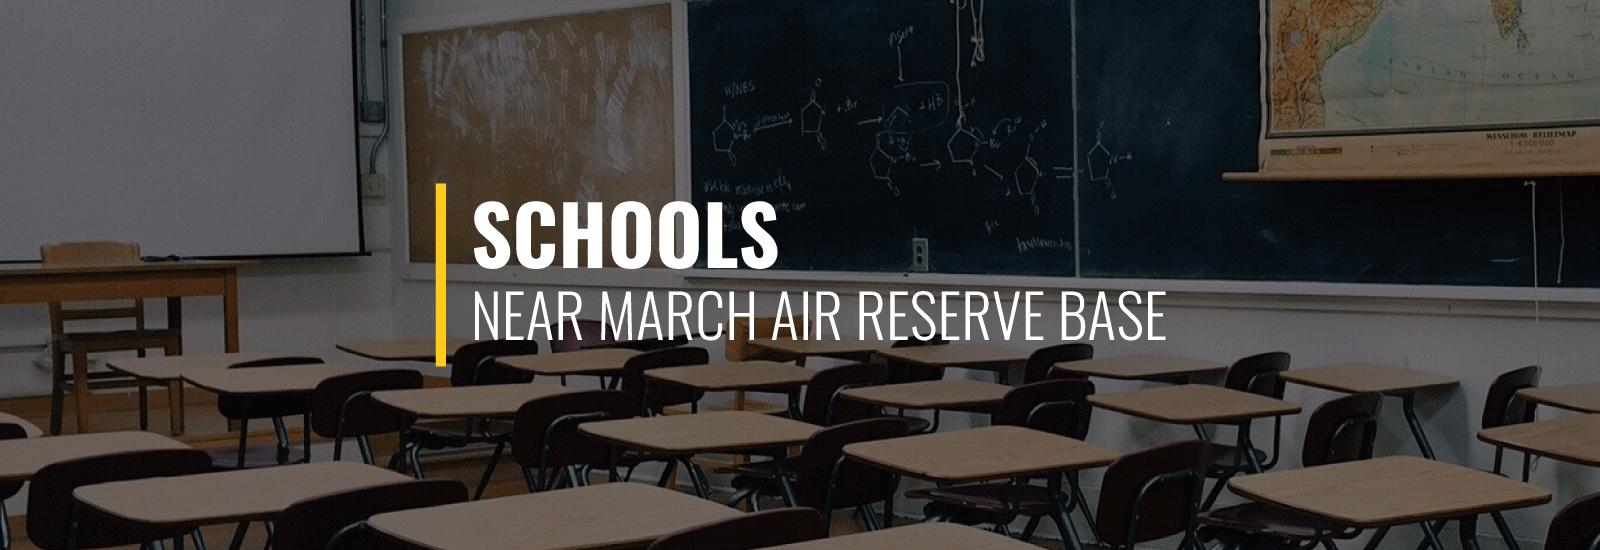 March Air Reserve Base Schools